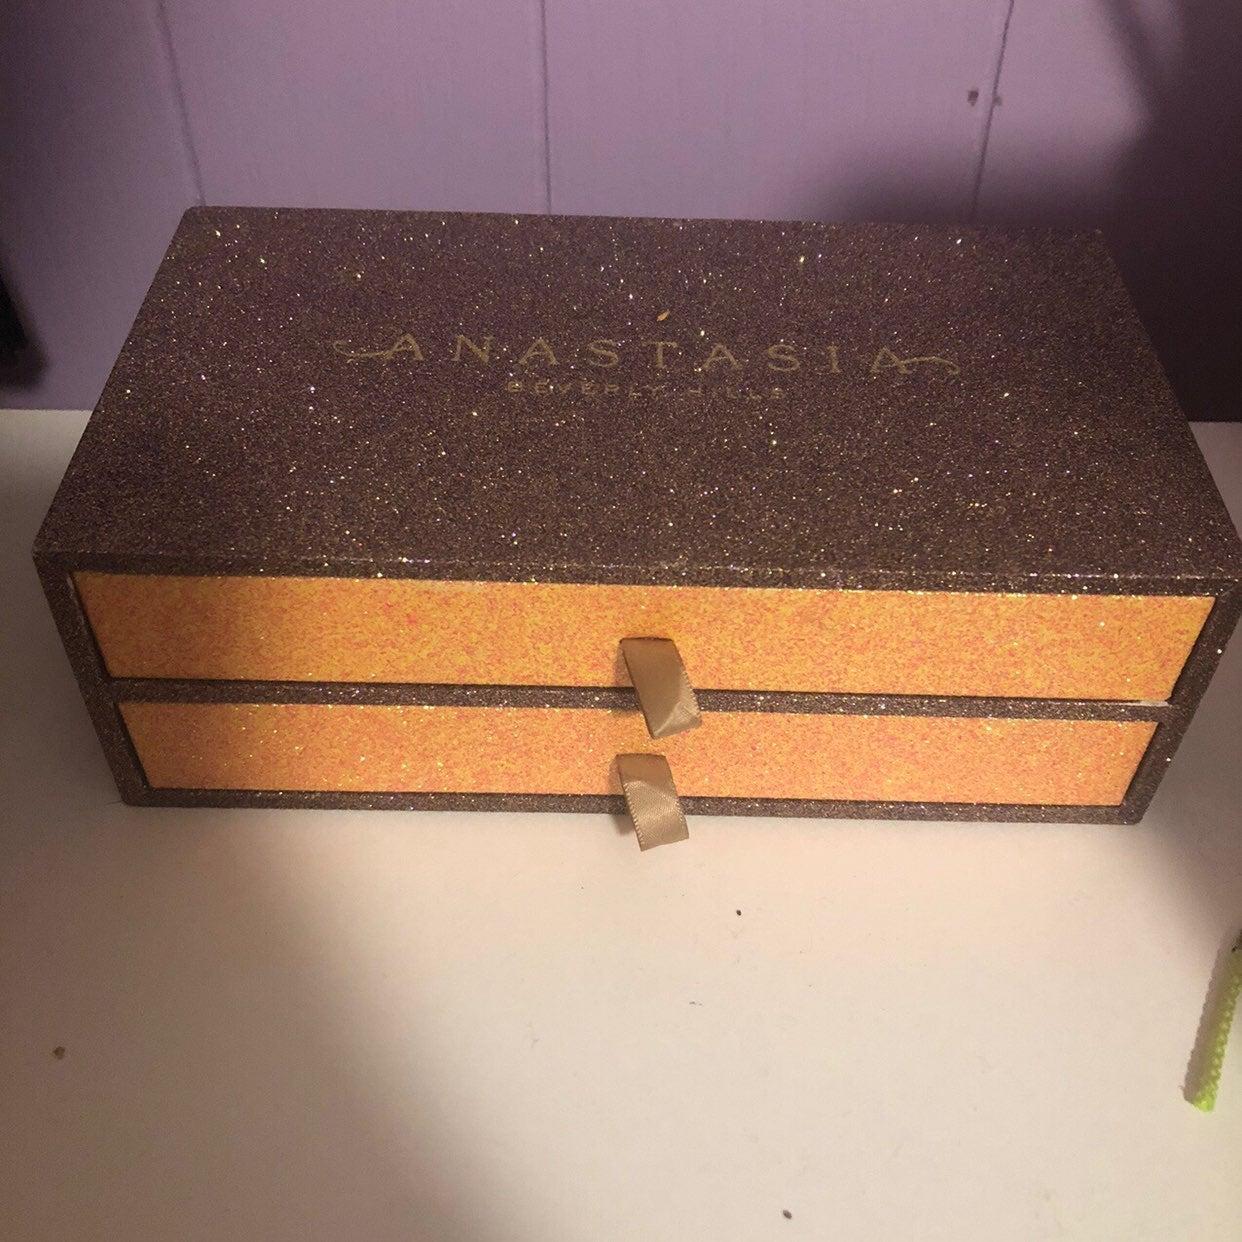 Anastasia Beverly Hills vault box